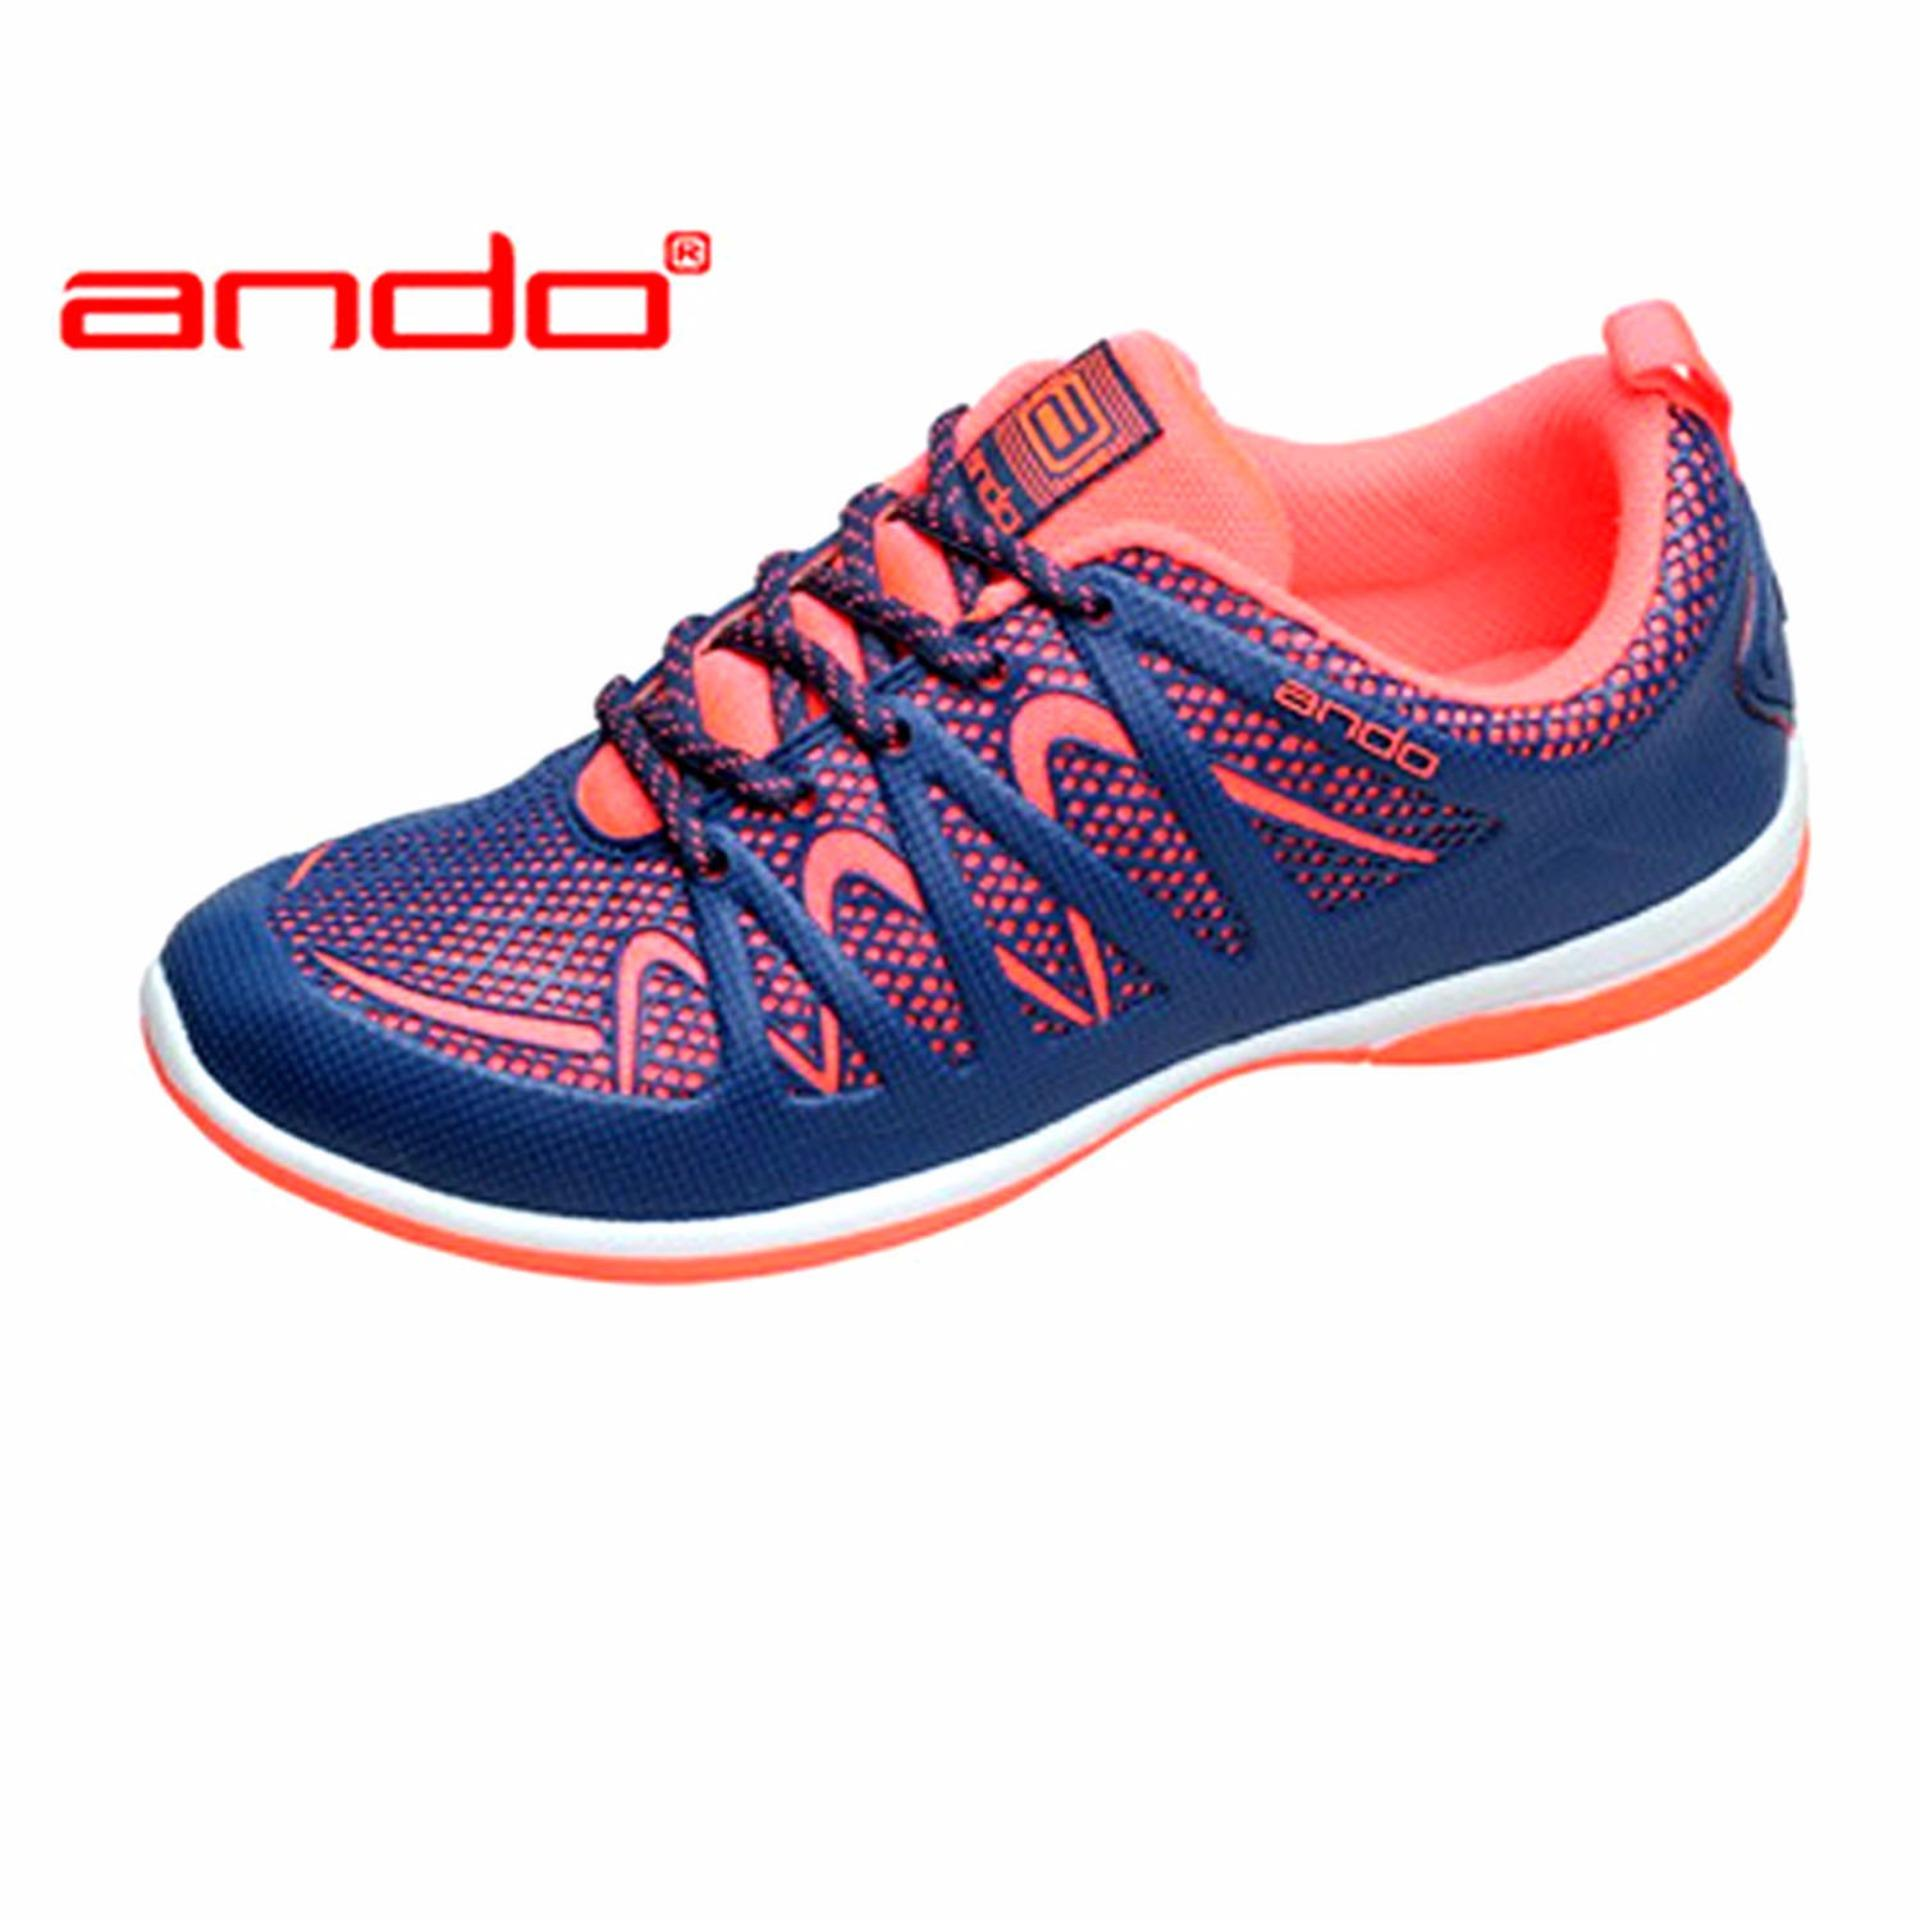 Toko Ando Kimmy Sepatu Olahraga Warna Navy Orange Online Di Indonesia